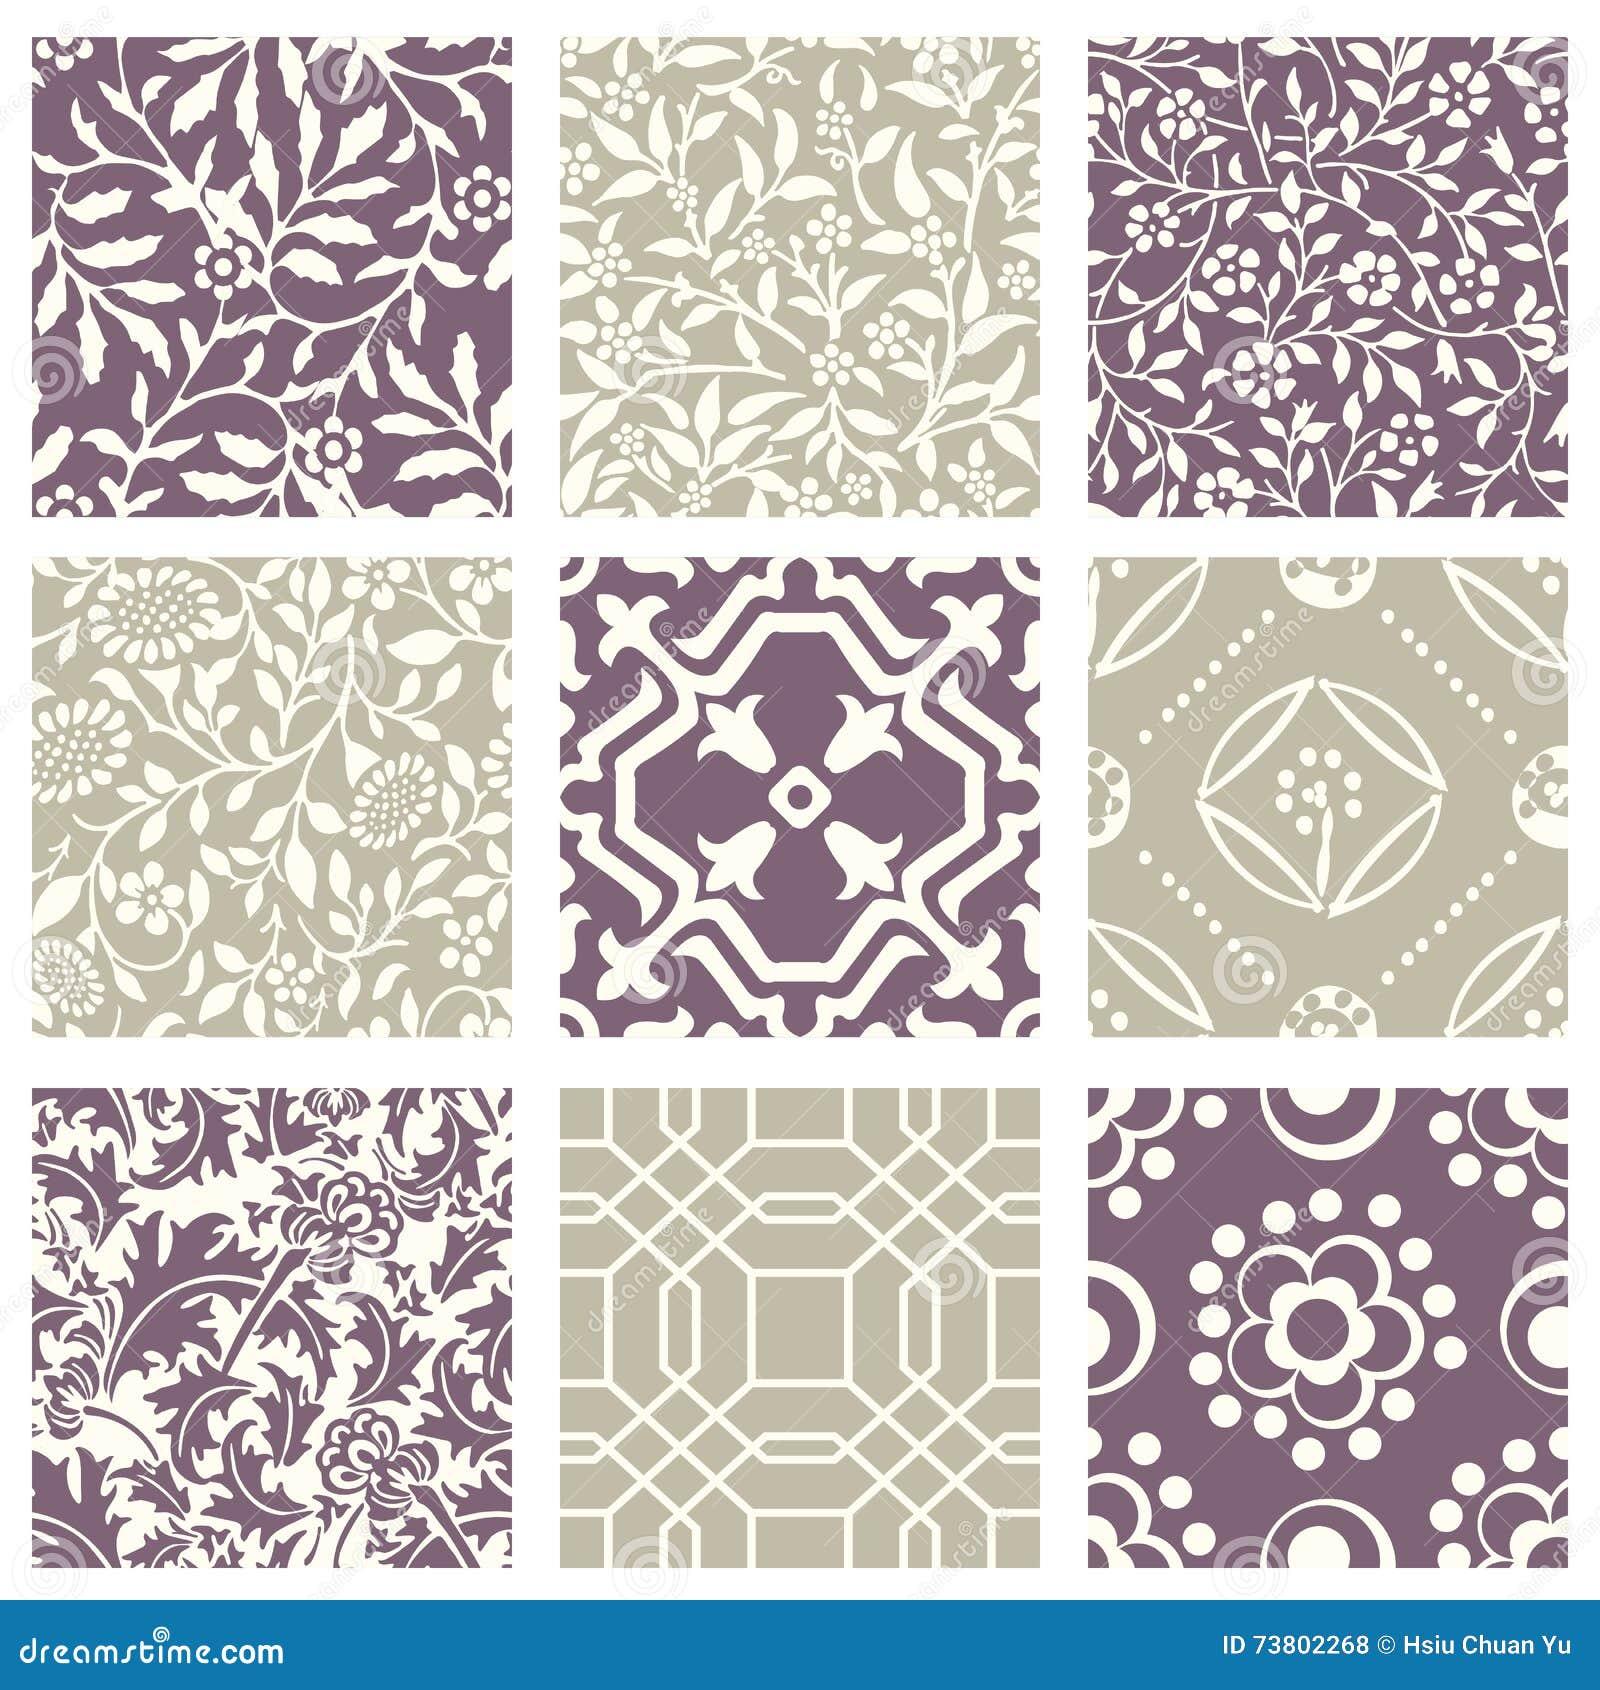 Vintage pastel pattern - photo#41